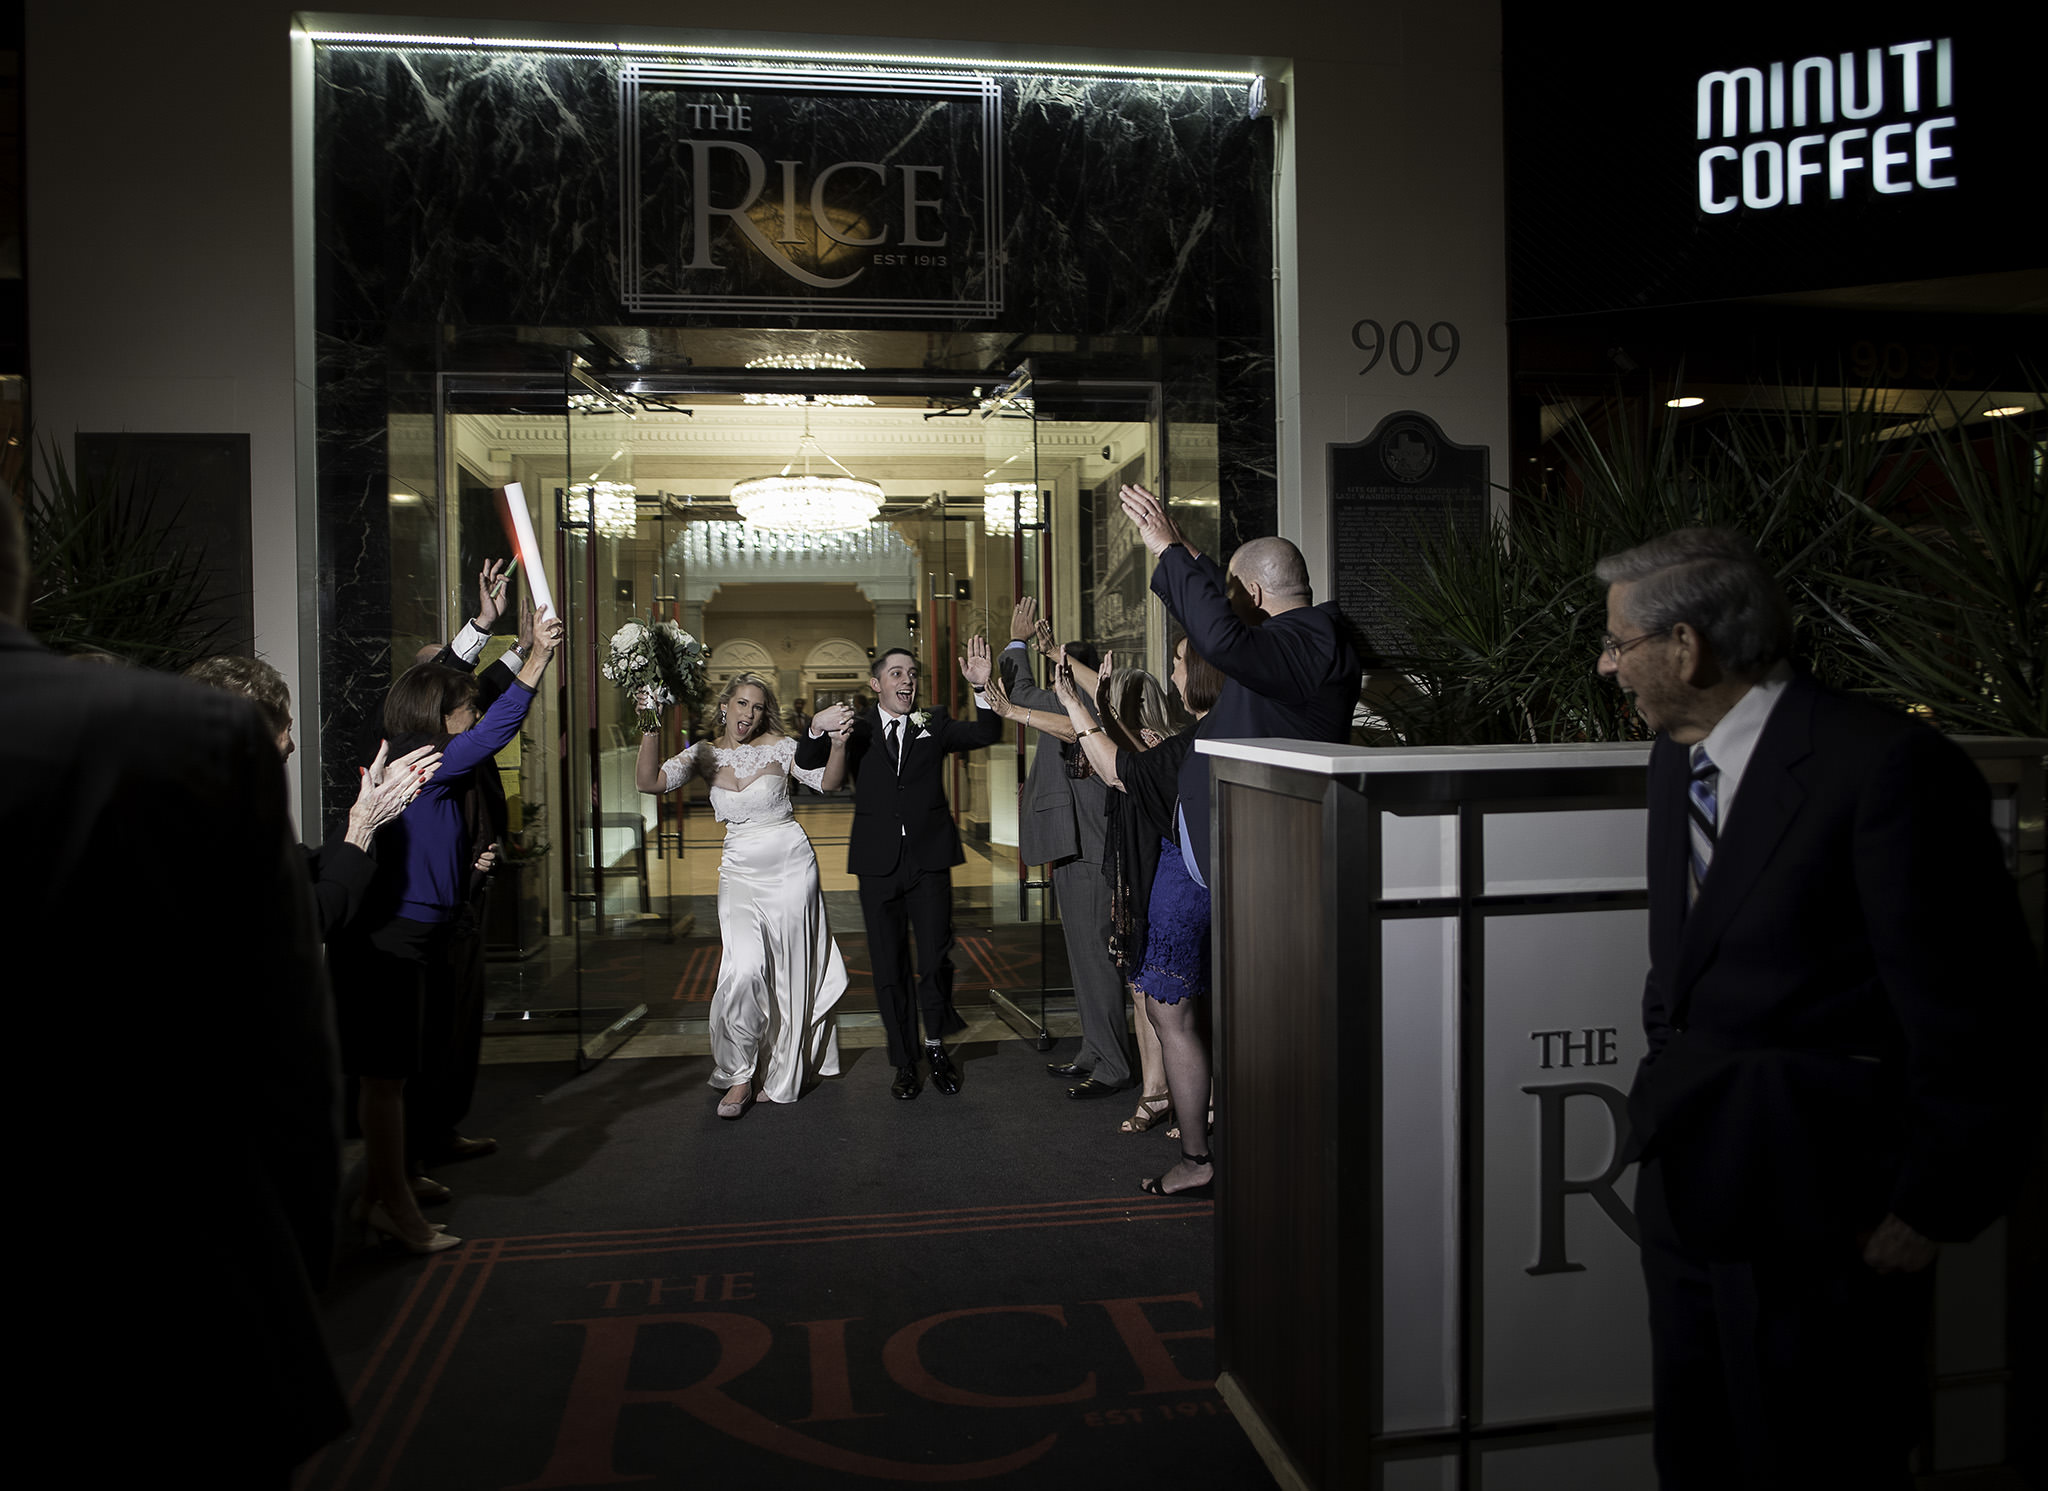 Claire-Travis-Classy-artistic-Downtown-Houston-Rice-ballroom-wedding-sm-029.jpg